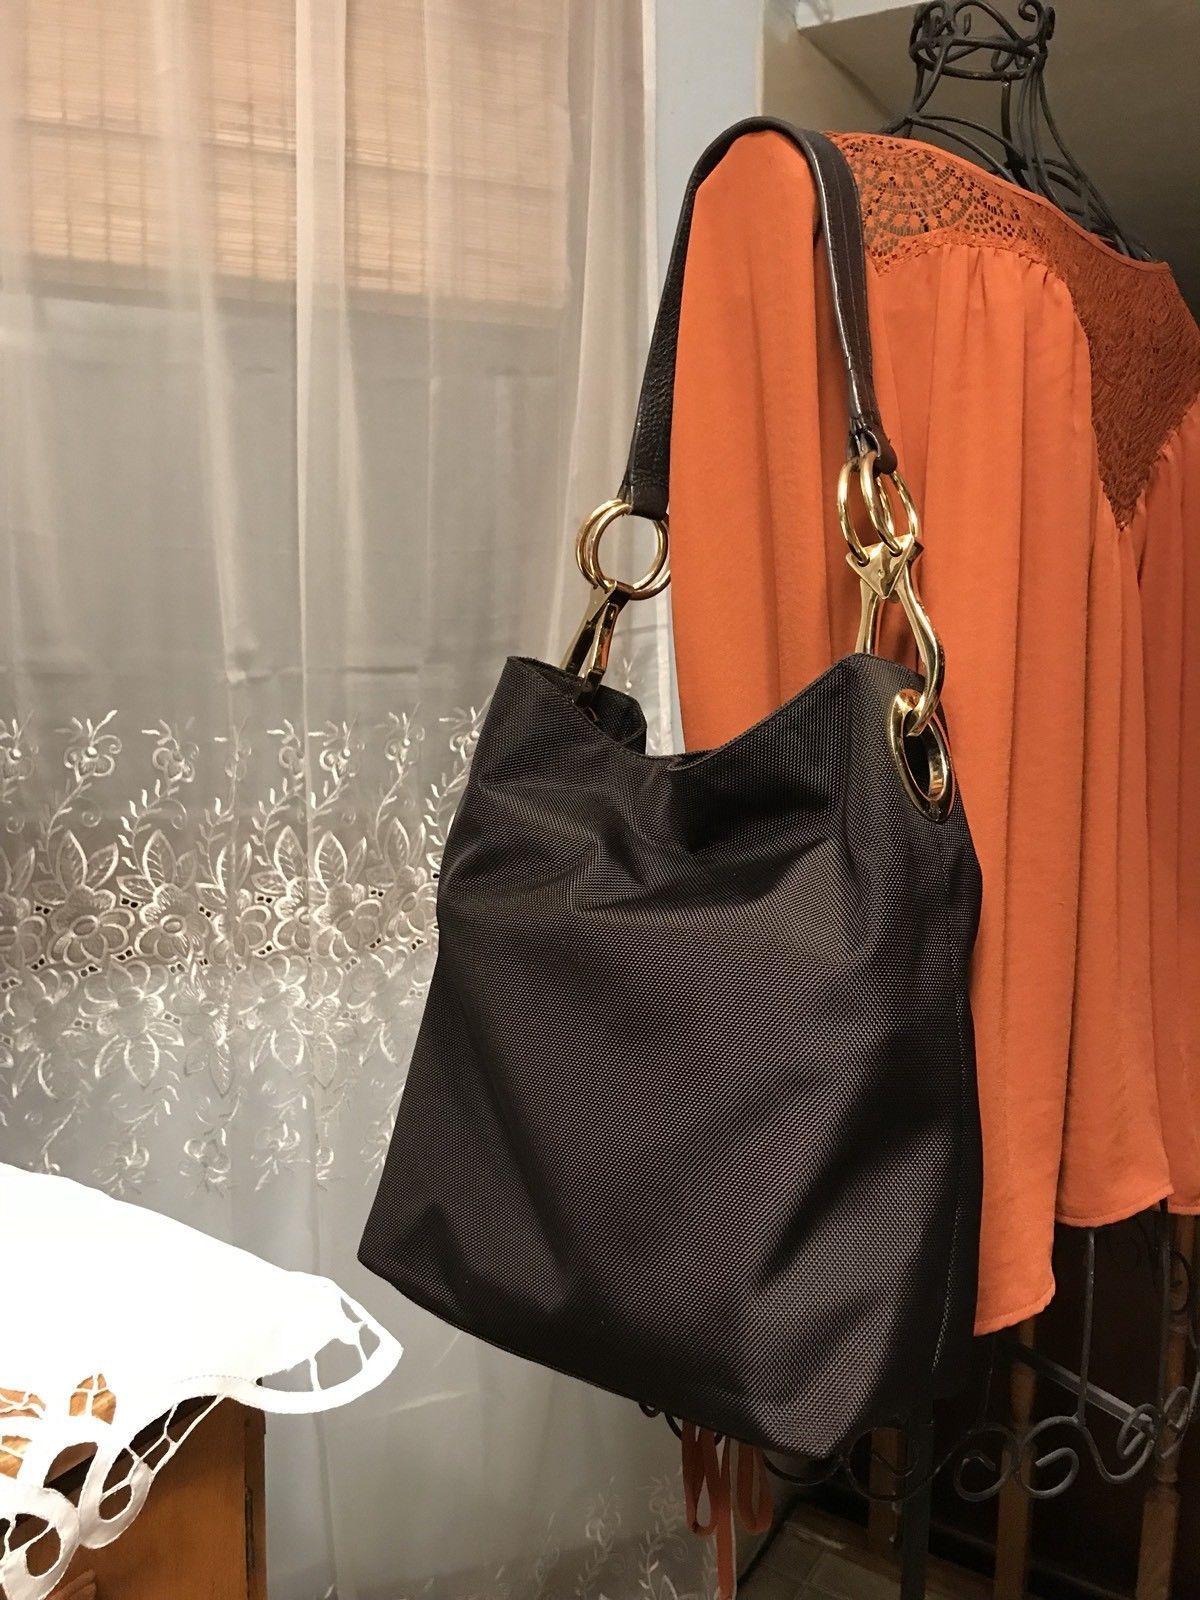 e96808c80063 JPK Paris 75 Nylon Hobo Bucket Tote Shoulder Bag Handbag - Dark Brown